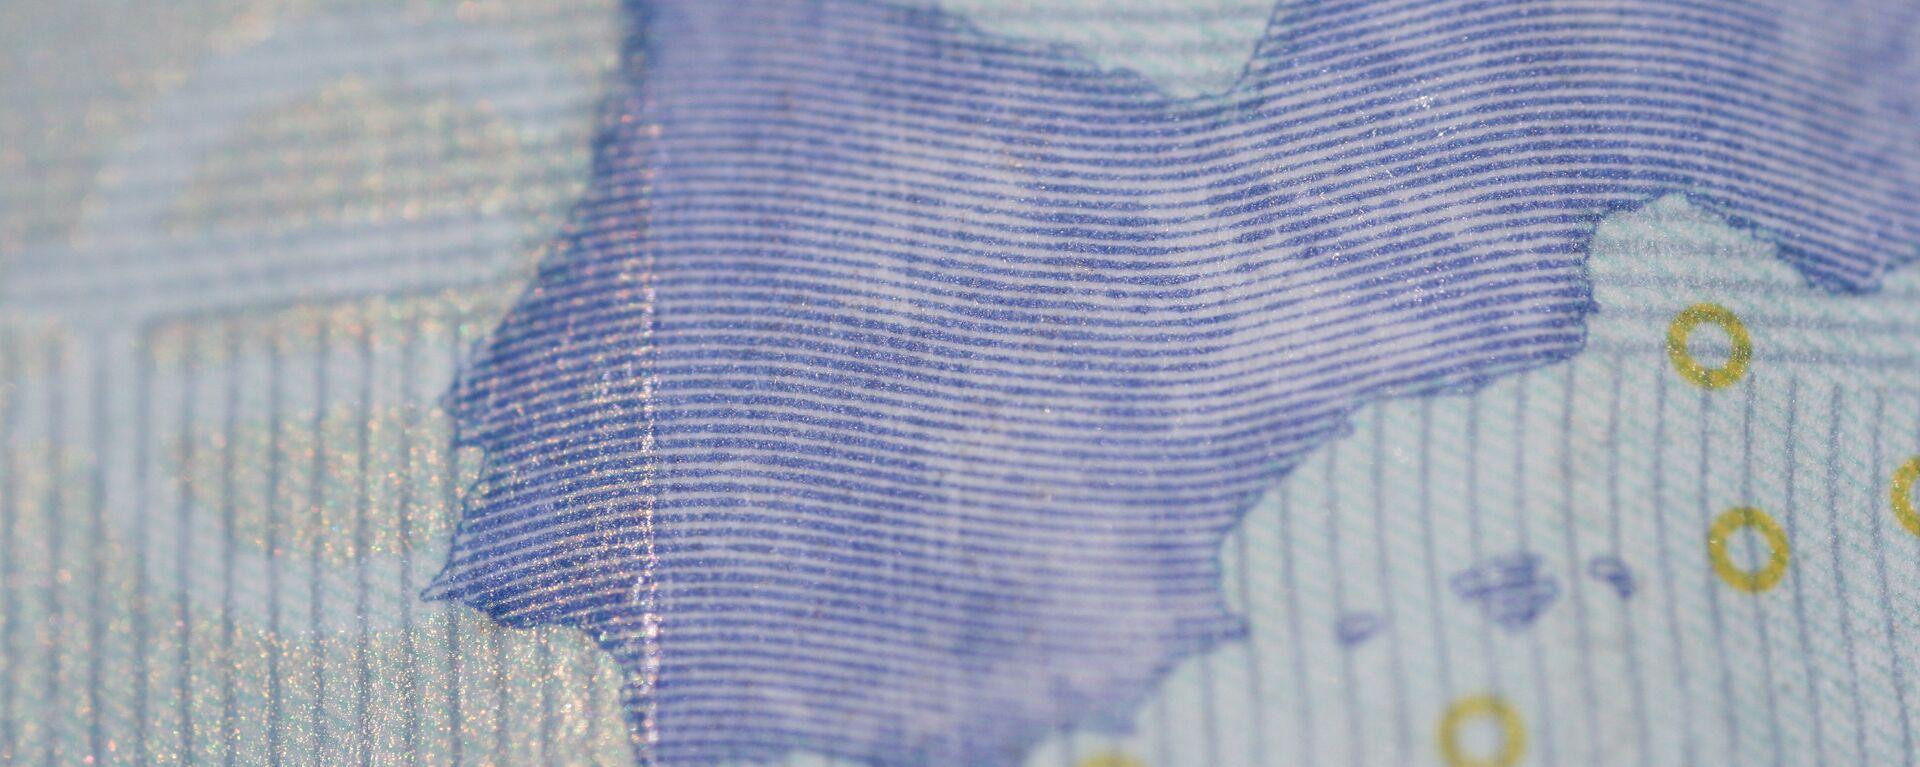 España en el billete de euro - Sputnik Mundo, 1920, 06.05.2021